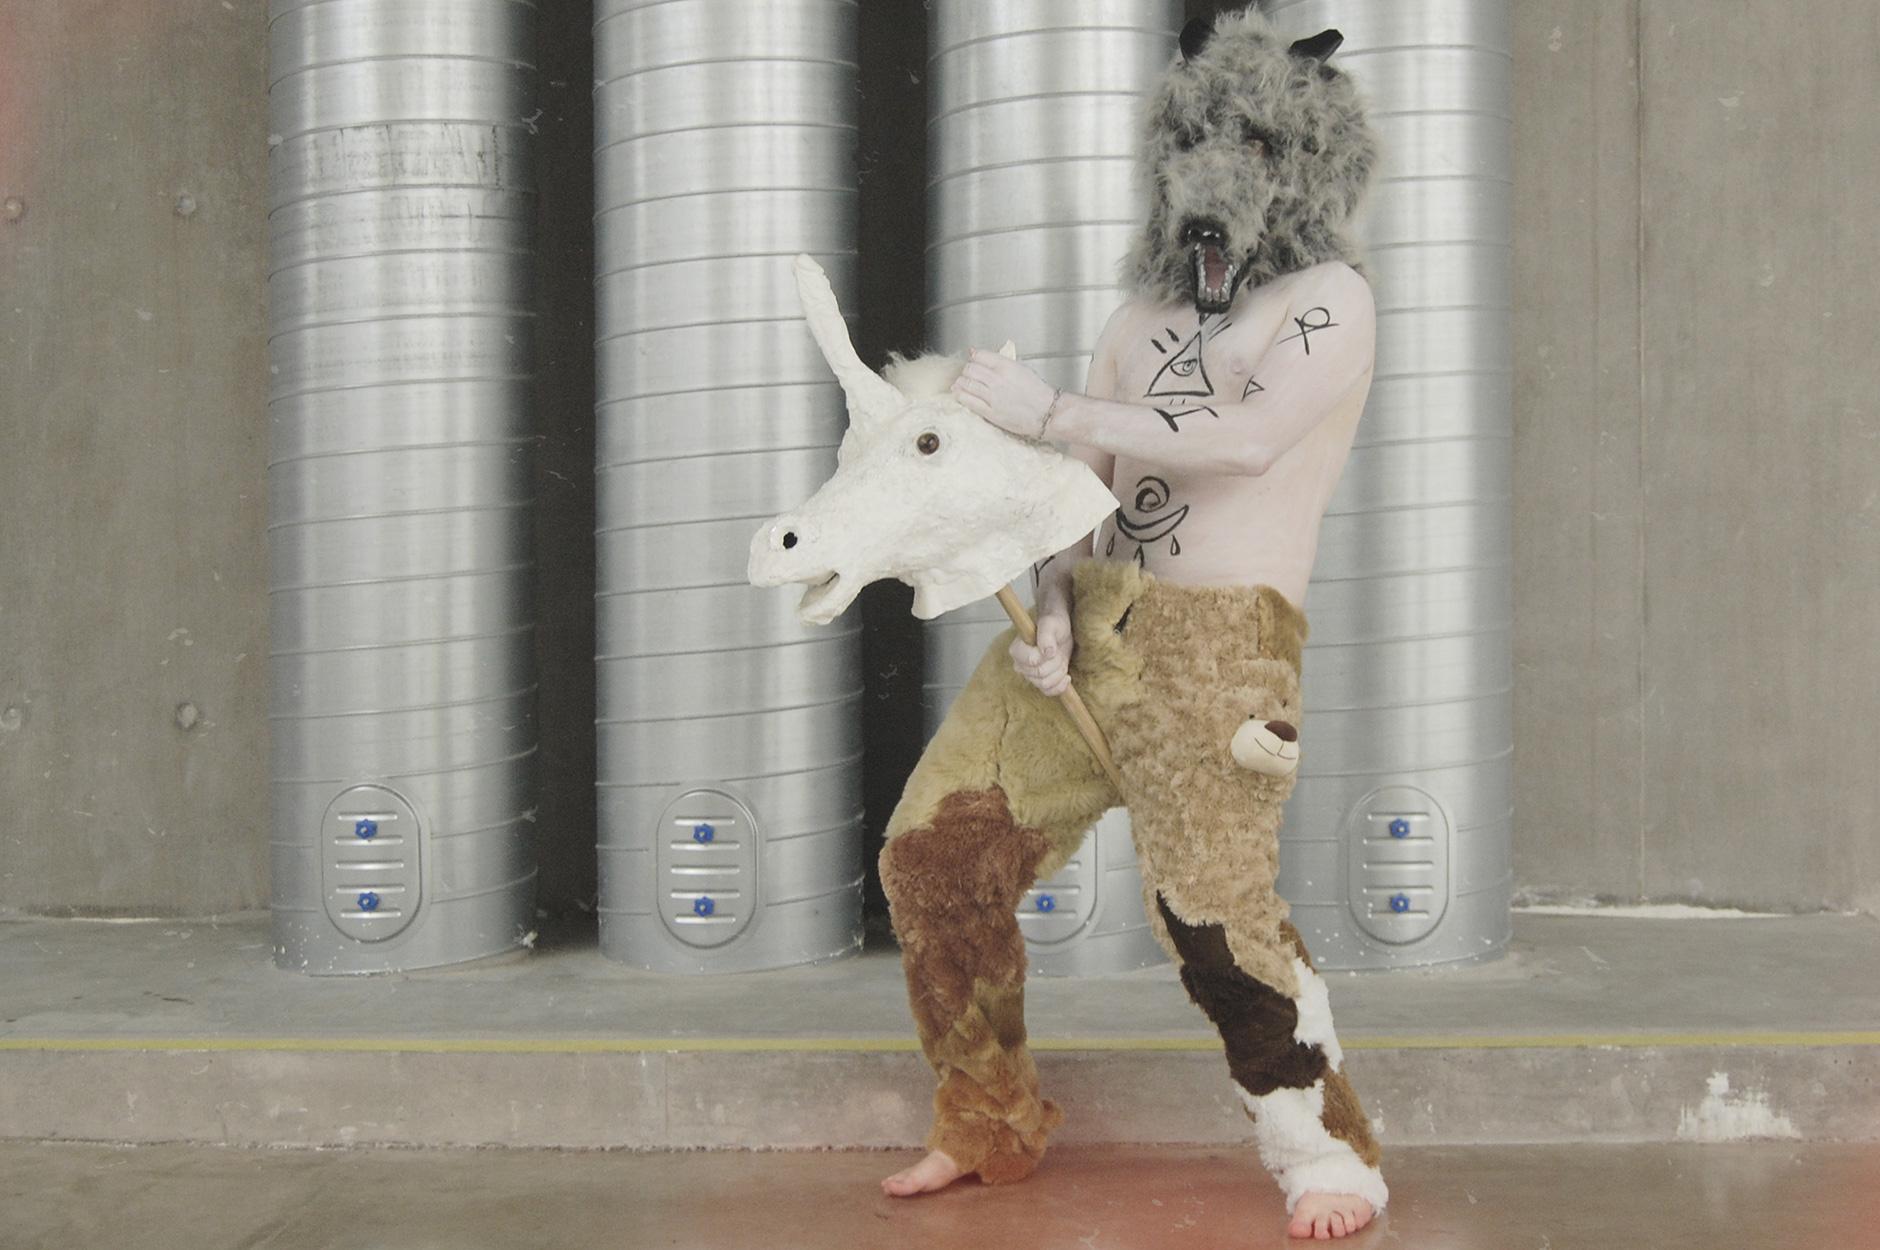 Farmer McPhallus Wild Man Unicorn Farmer